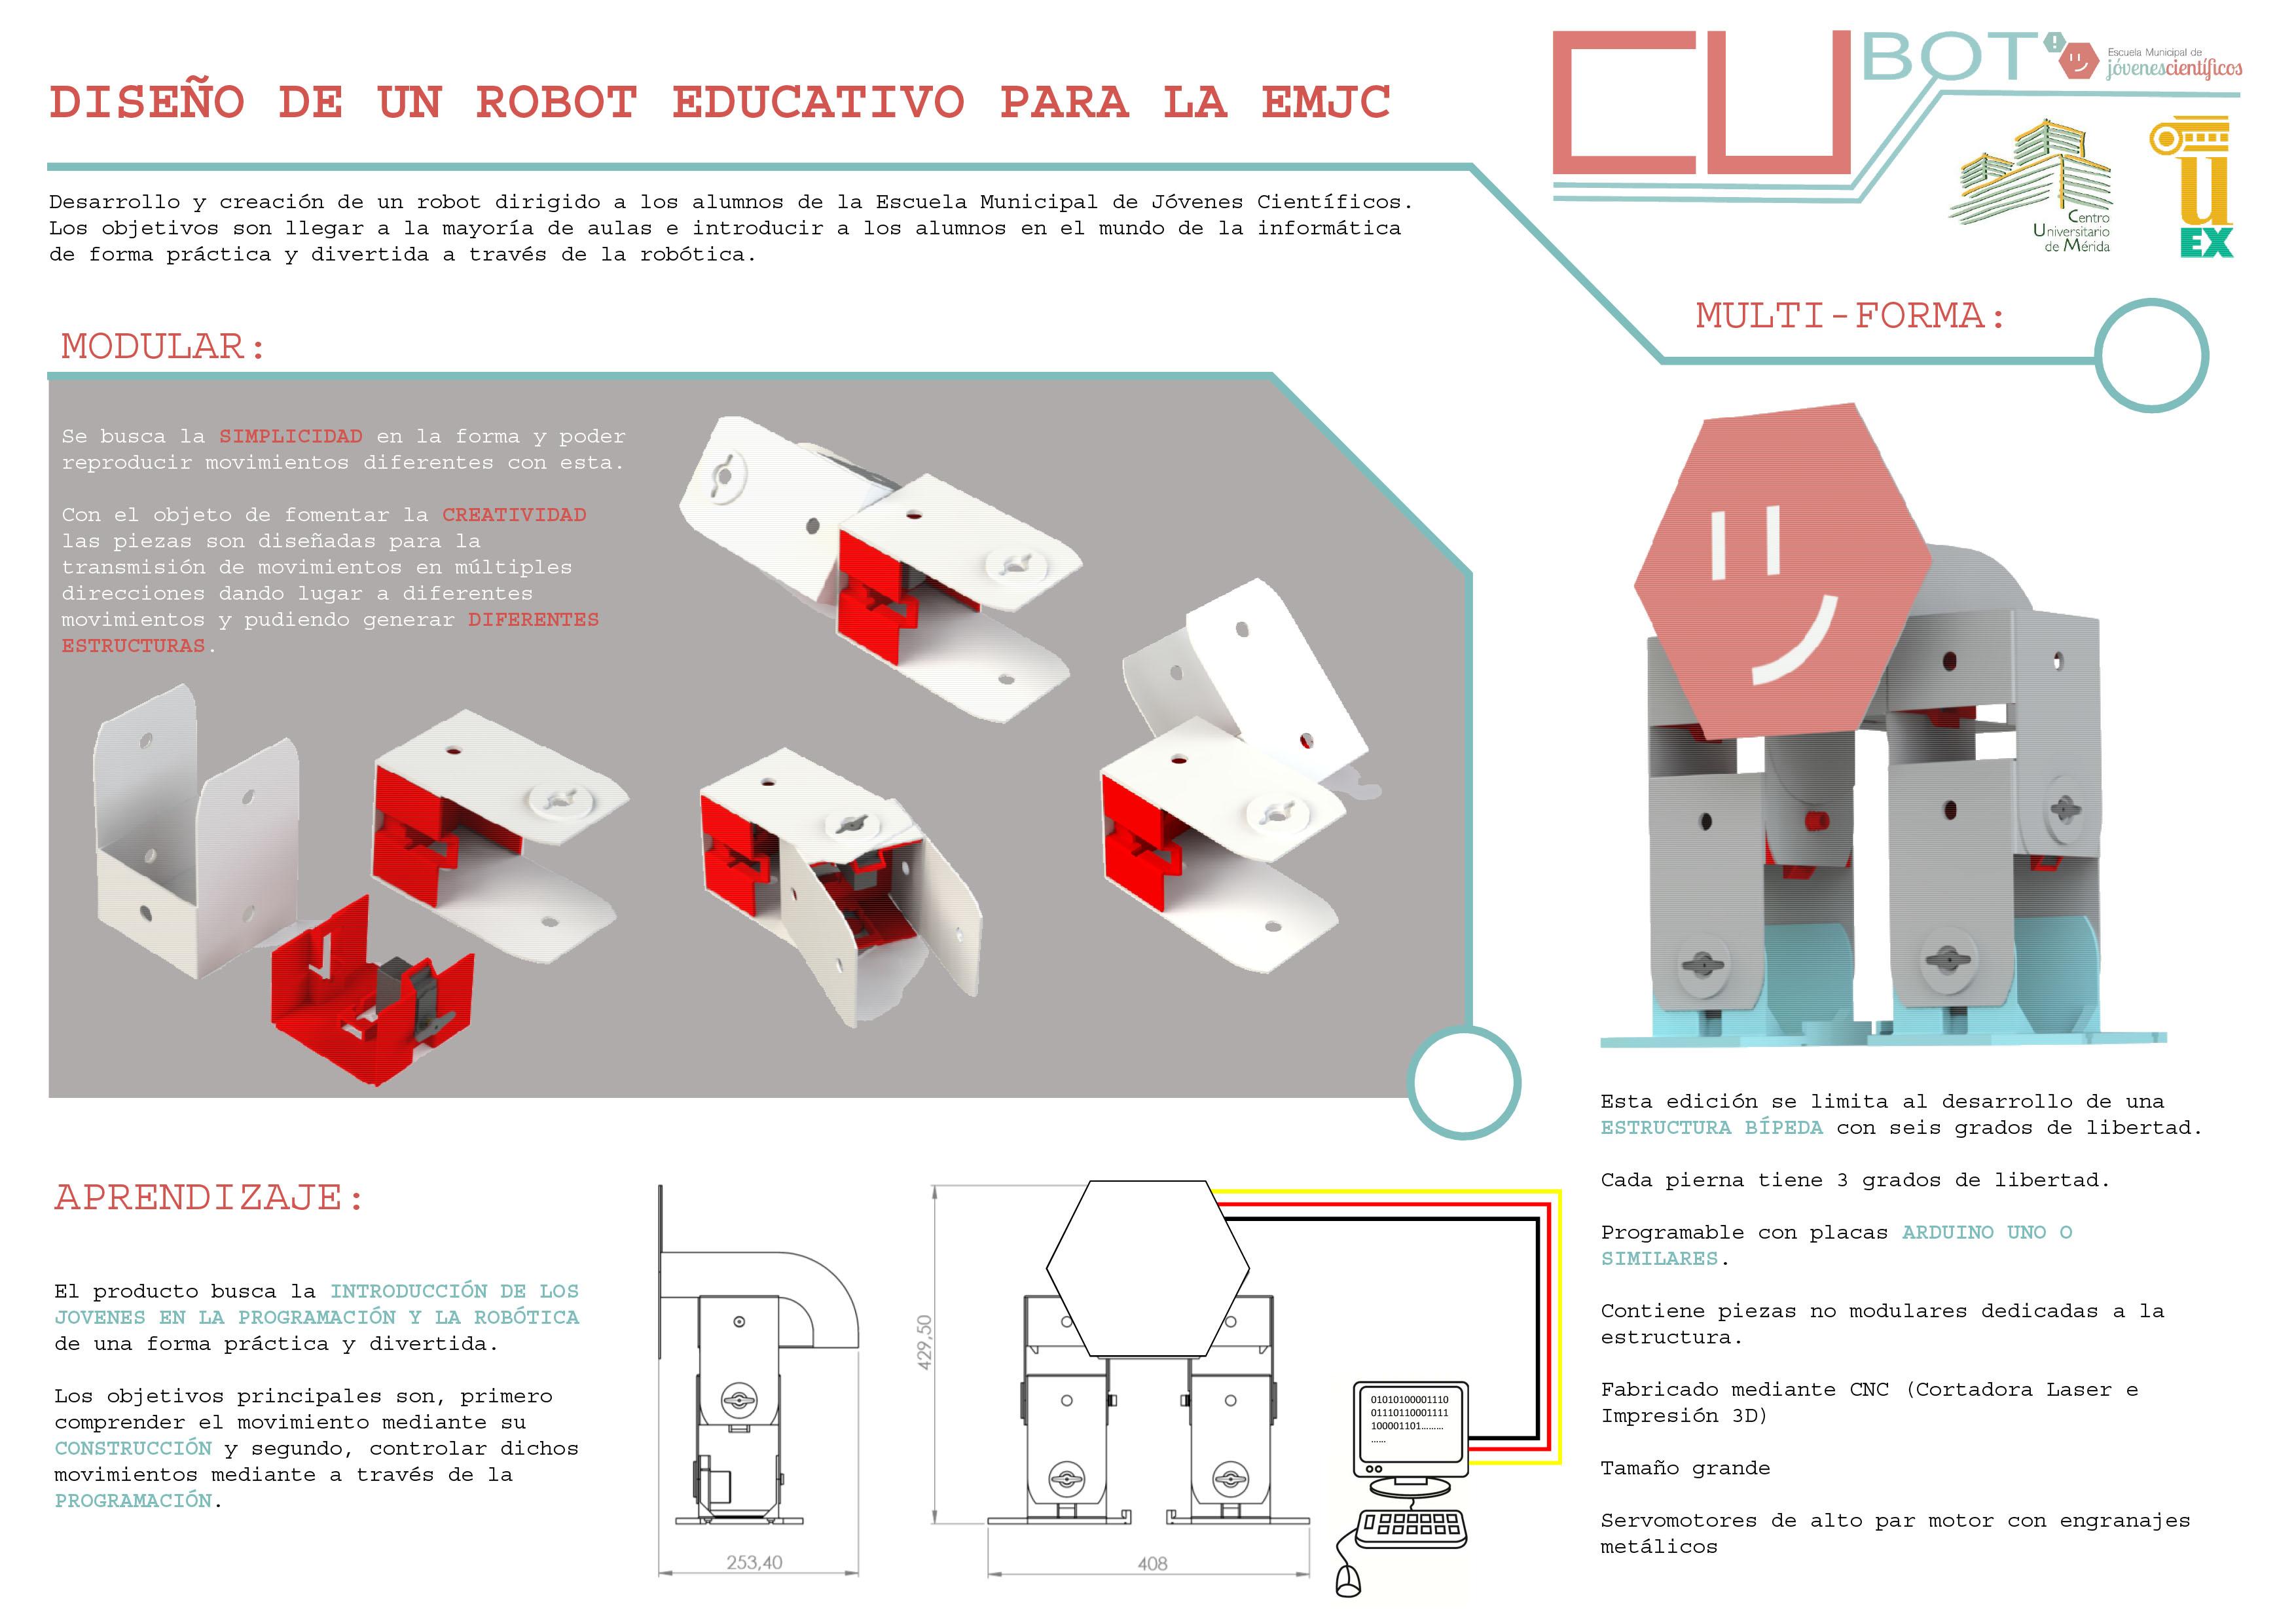 robot_educativo_emjc.jpg